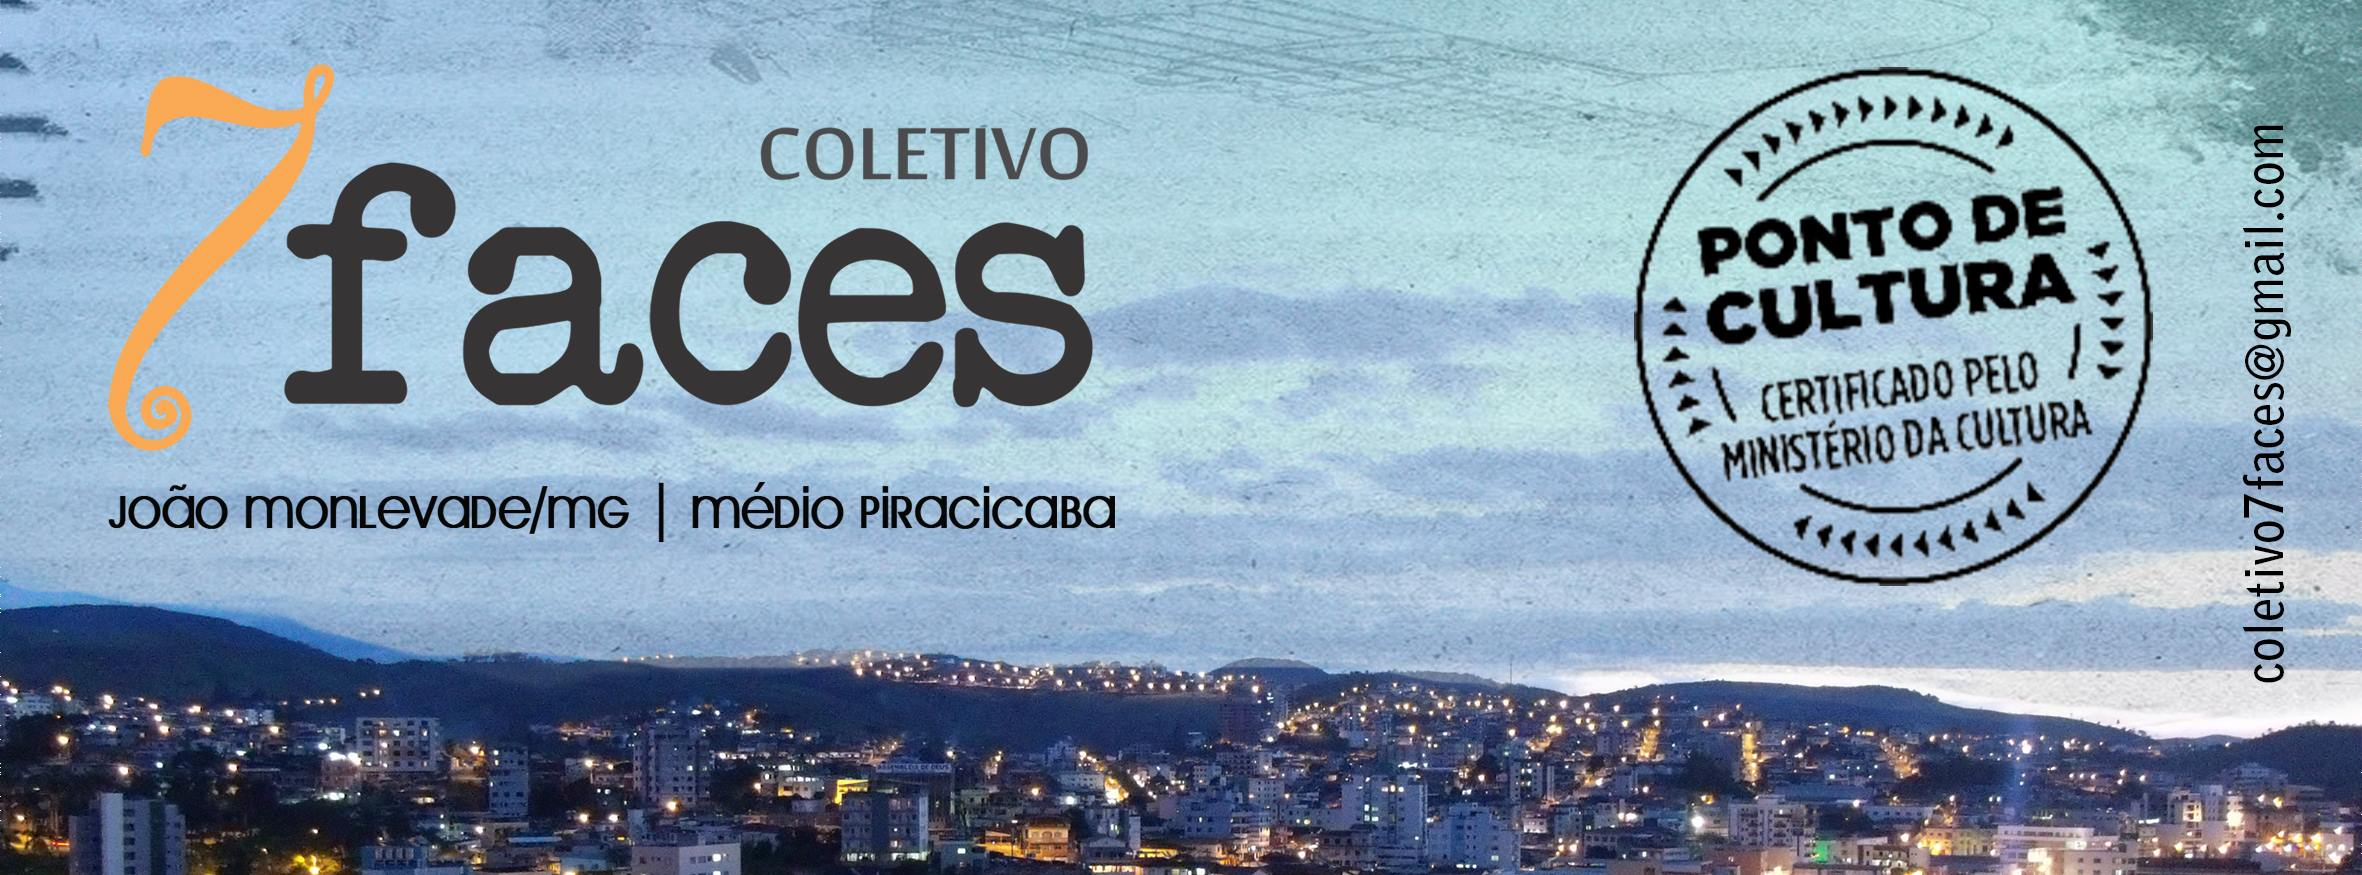 7faces